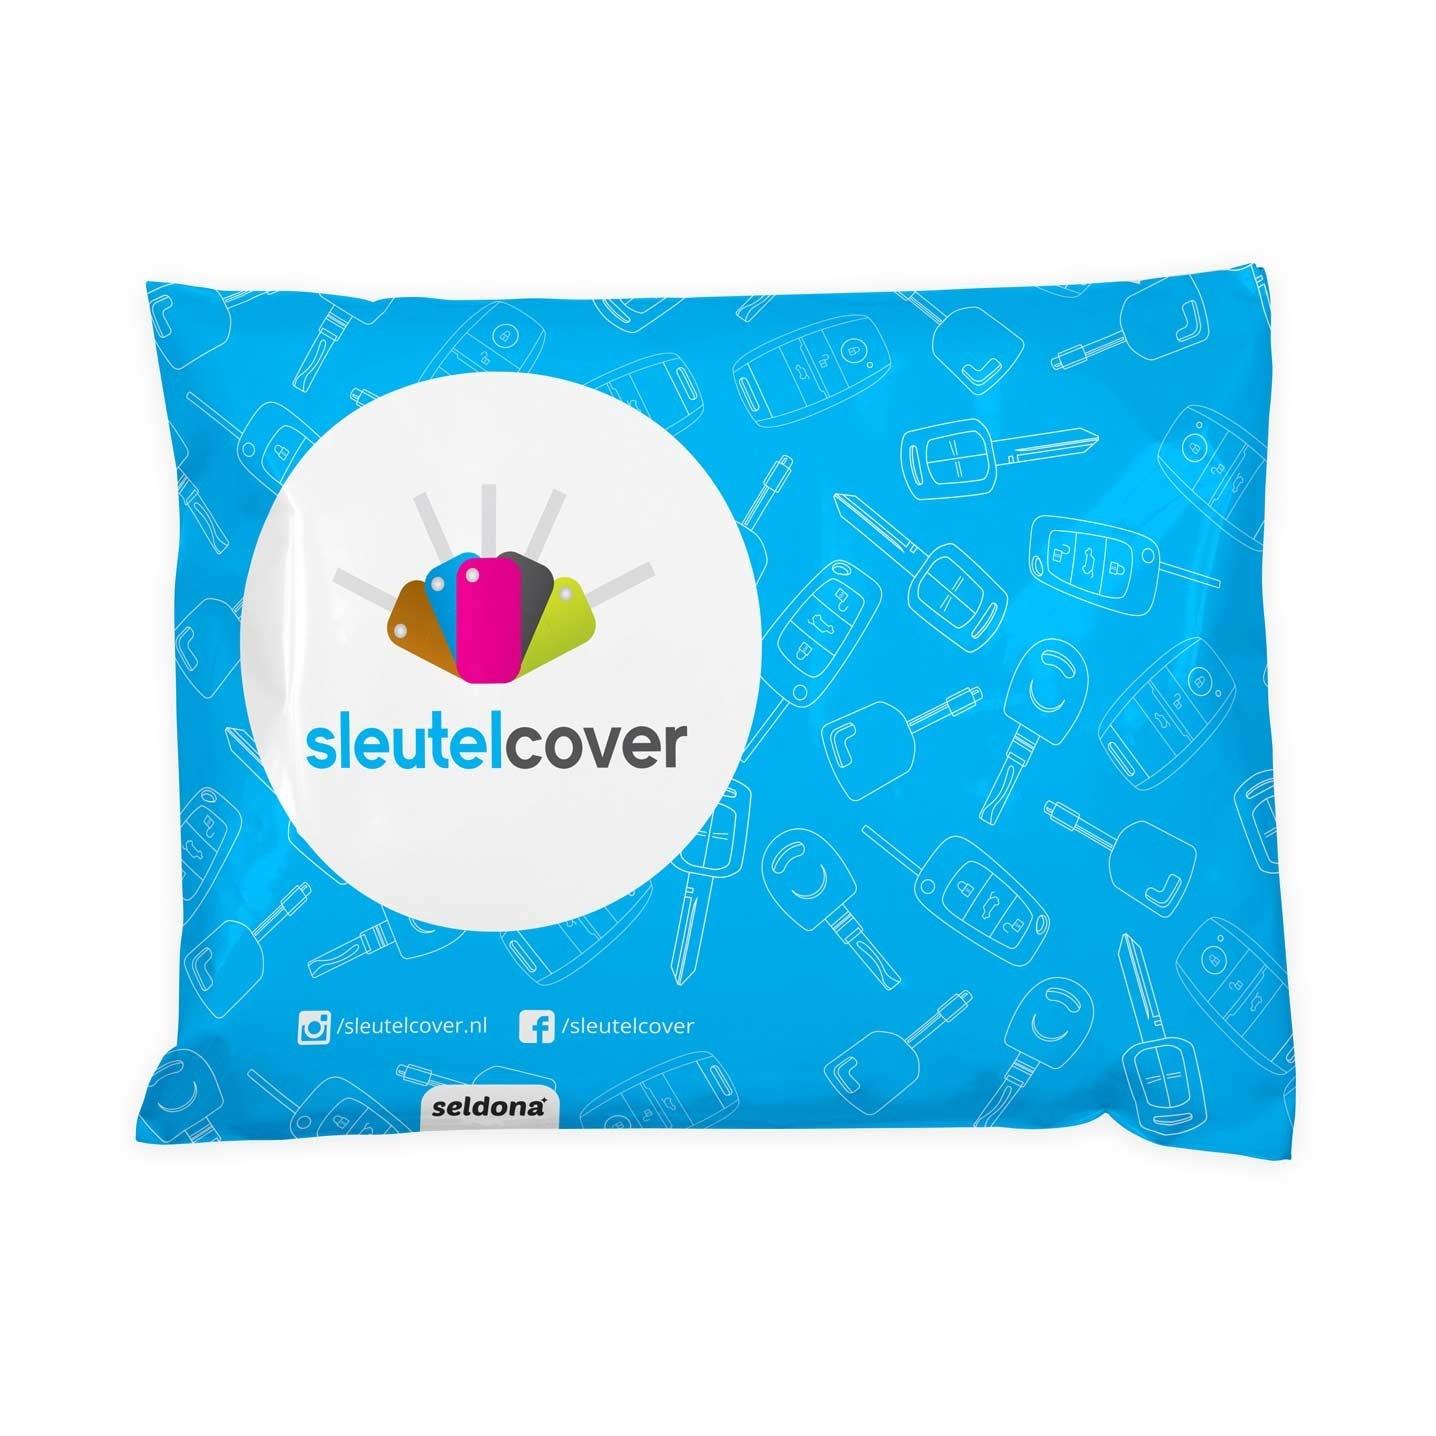 Chevrolet SleutelCover - Blauw / Silicone sleutelhoesje / beschermhoesje autosleutel